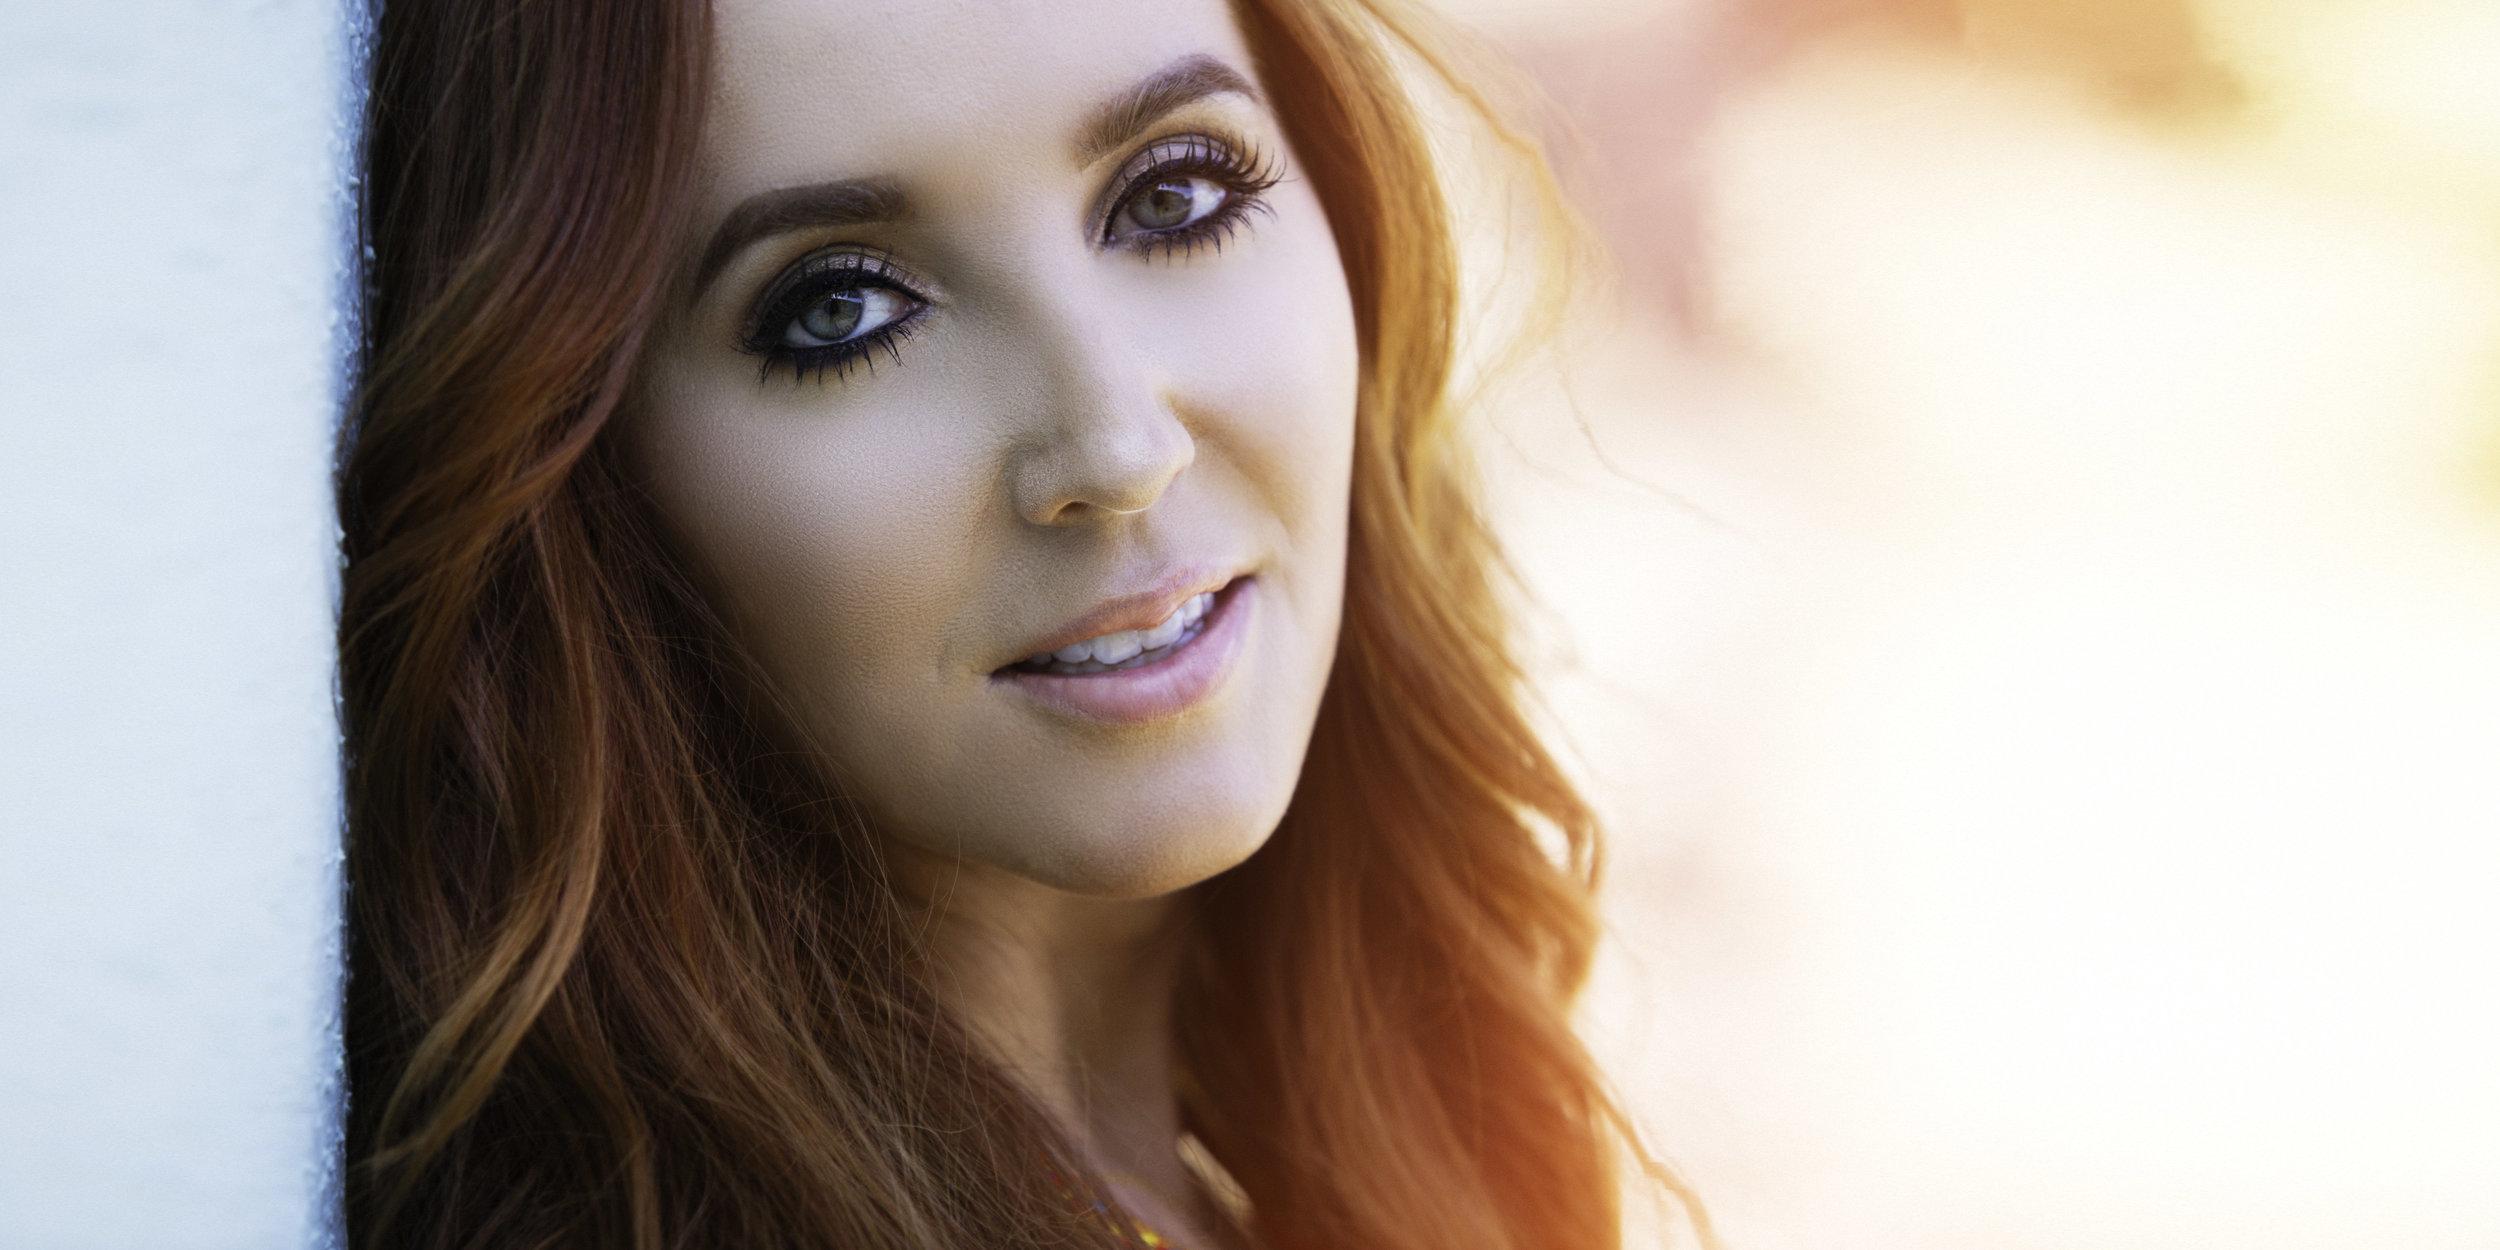 Dallas Portraits Beauty Photographer -3.jpg